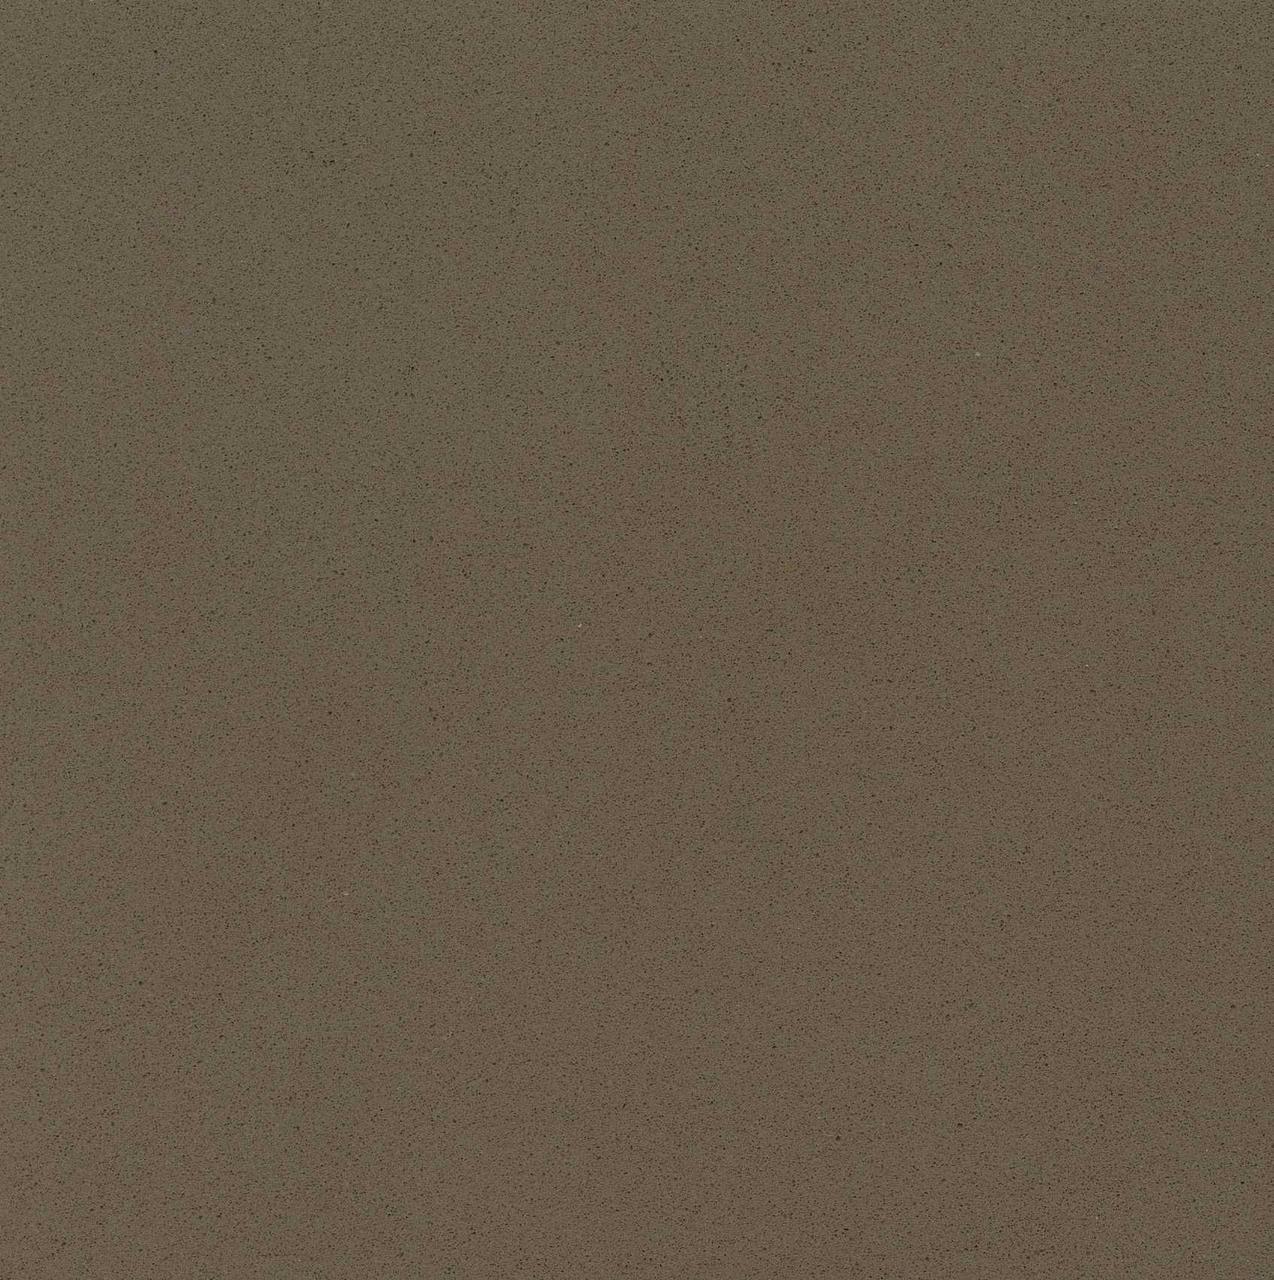 Искусственный камень, Кварц Silestone Unsui 20 мм